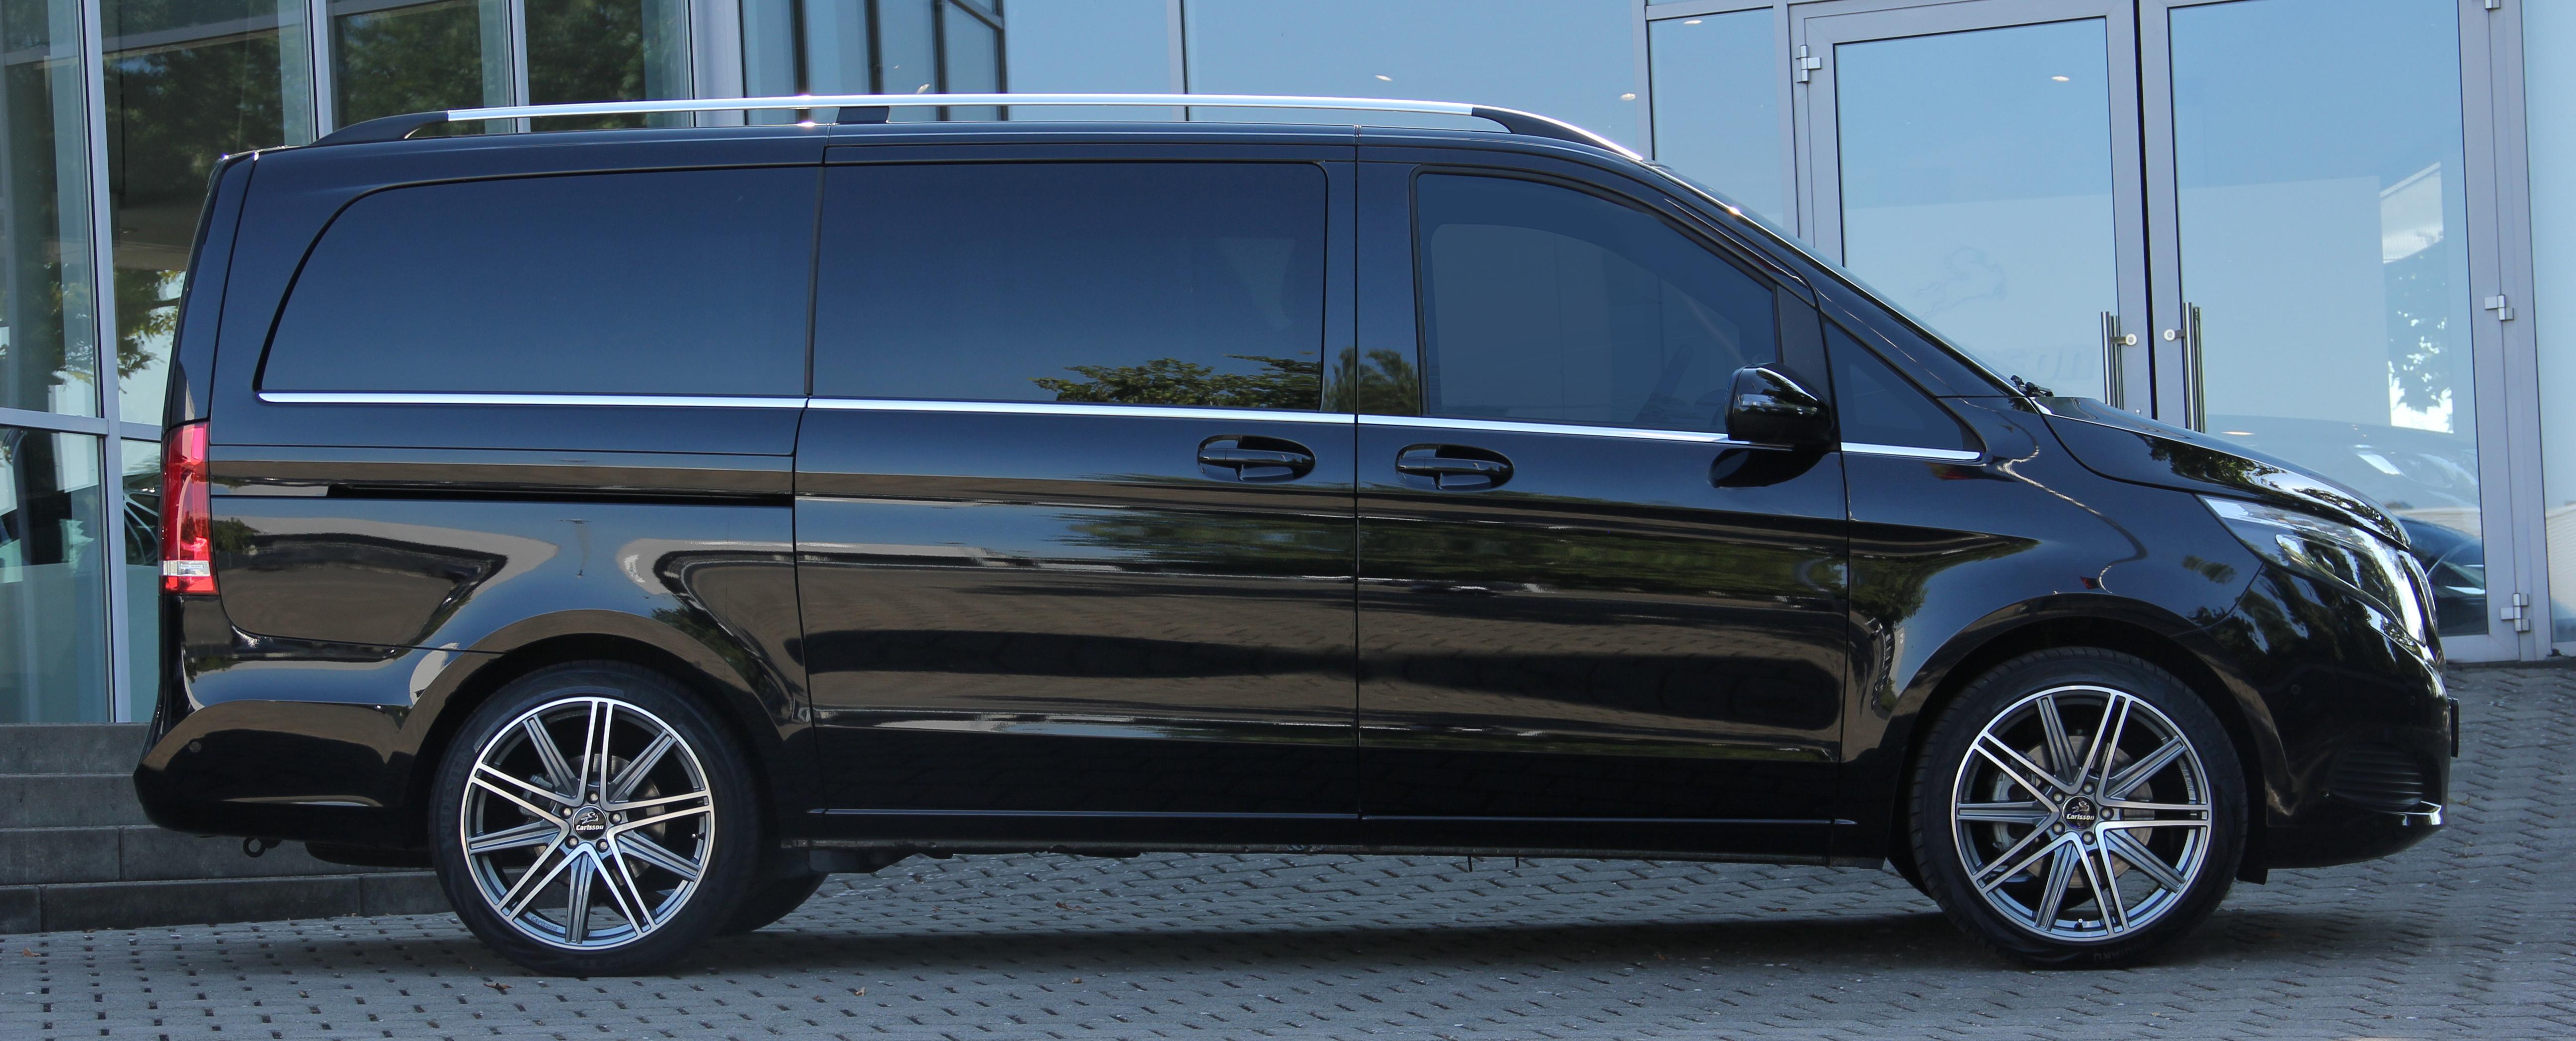 Benz blau klasse mercedes v Mercedes Farbcodes